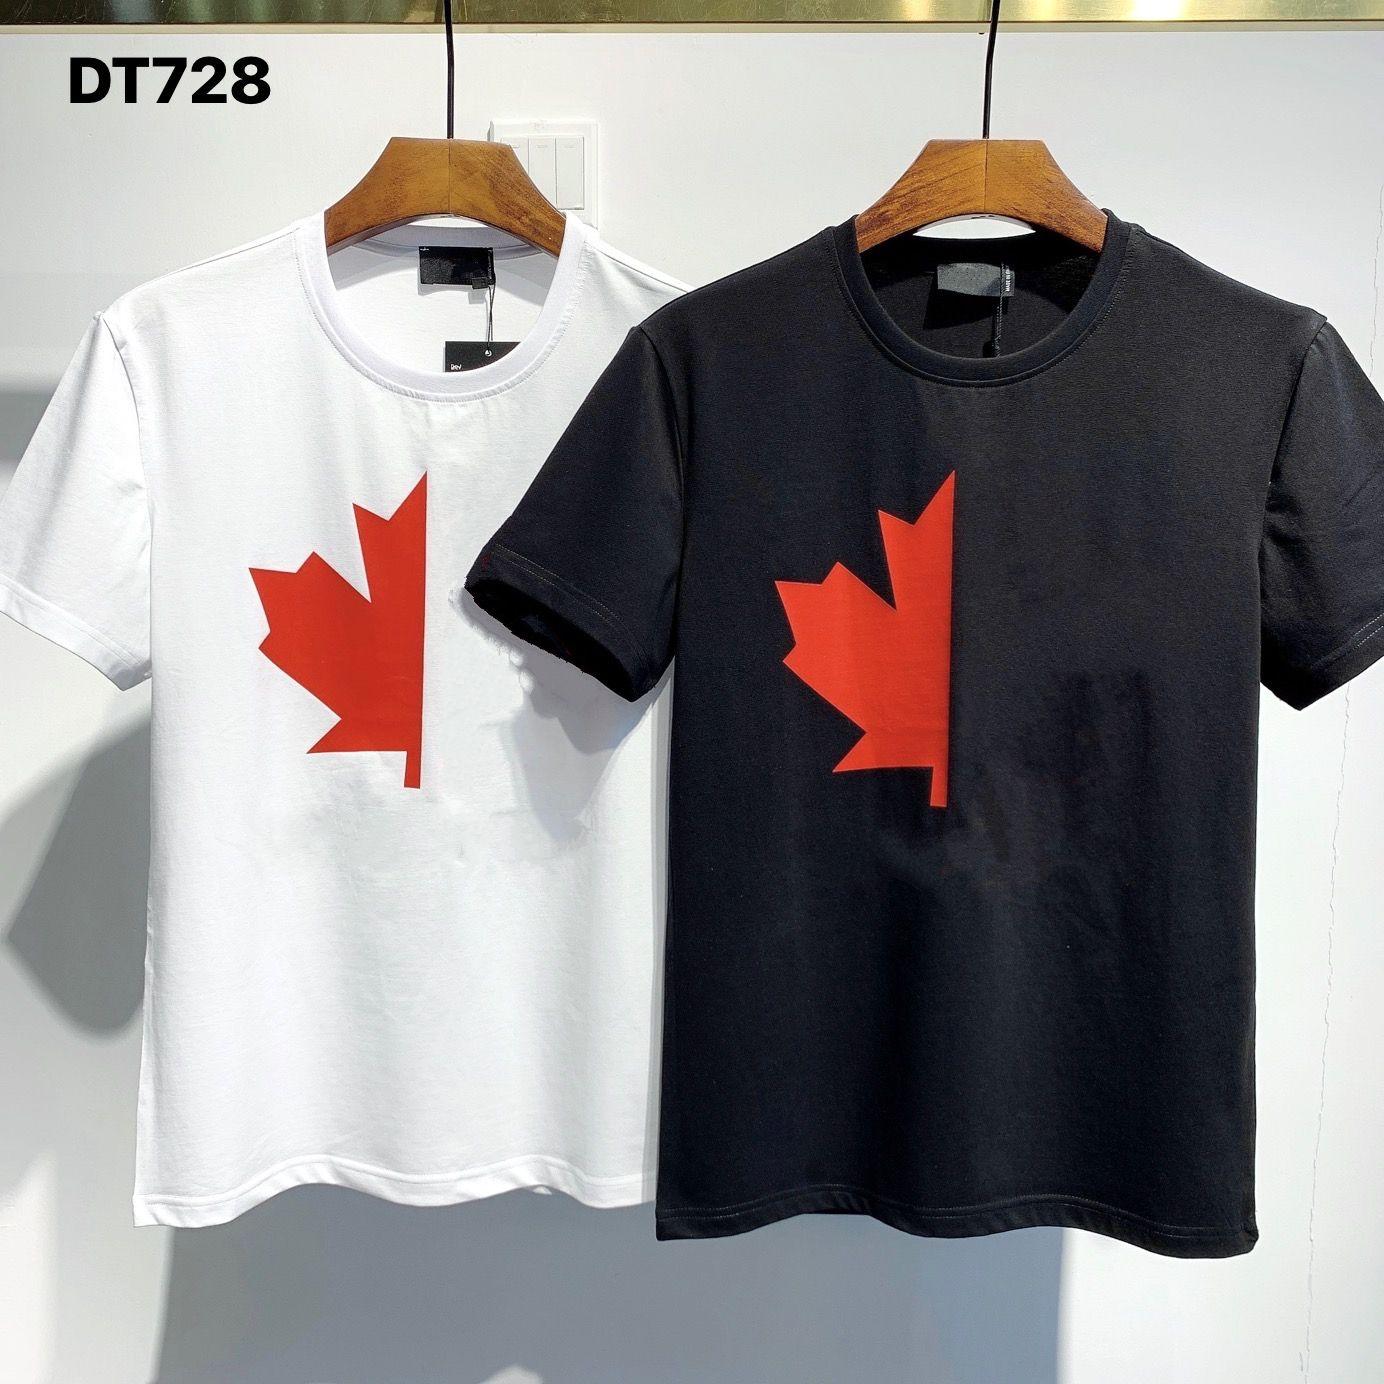 Moda 2021 Designer Marca Italiana Homens Camiseta Polos De Homens Tag Tag Bee Patch Bordado Stripe Polo PoloCirts Shorts Tee